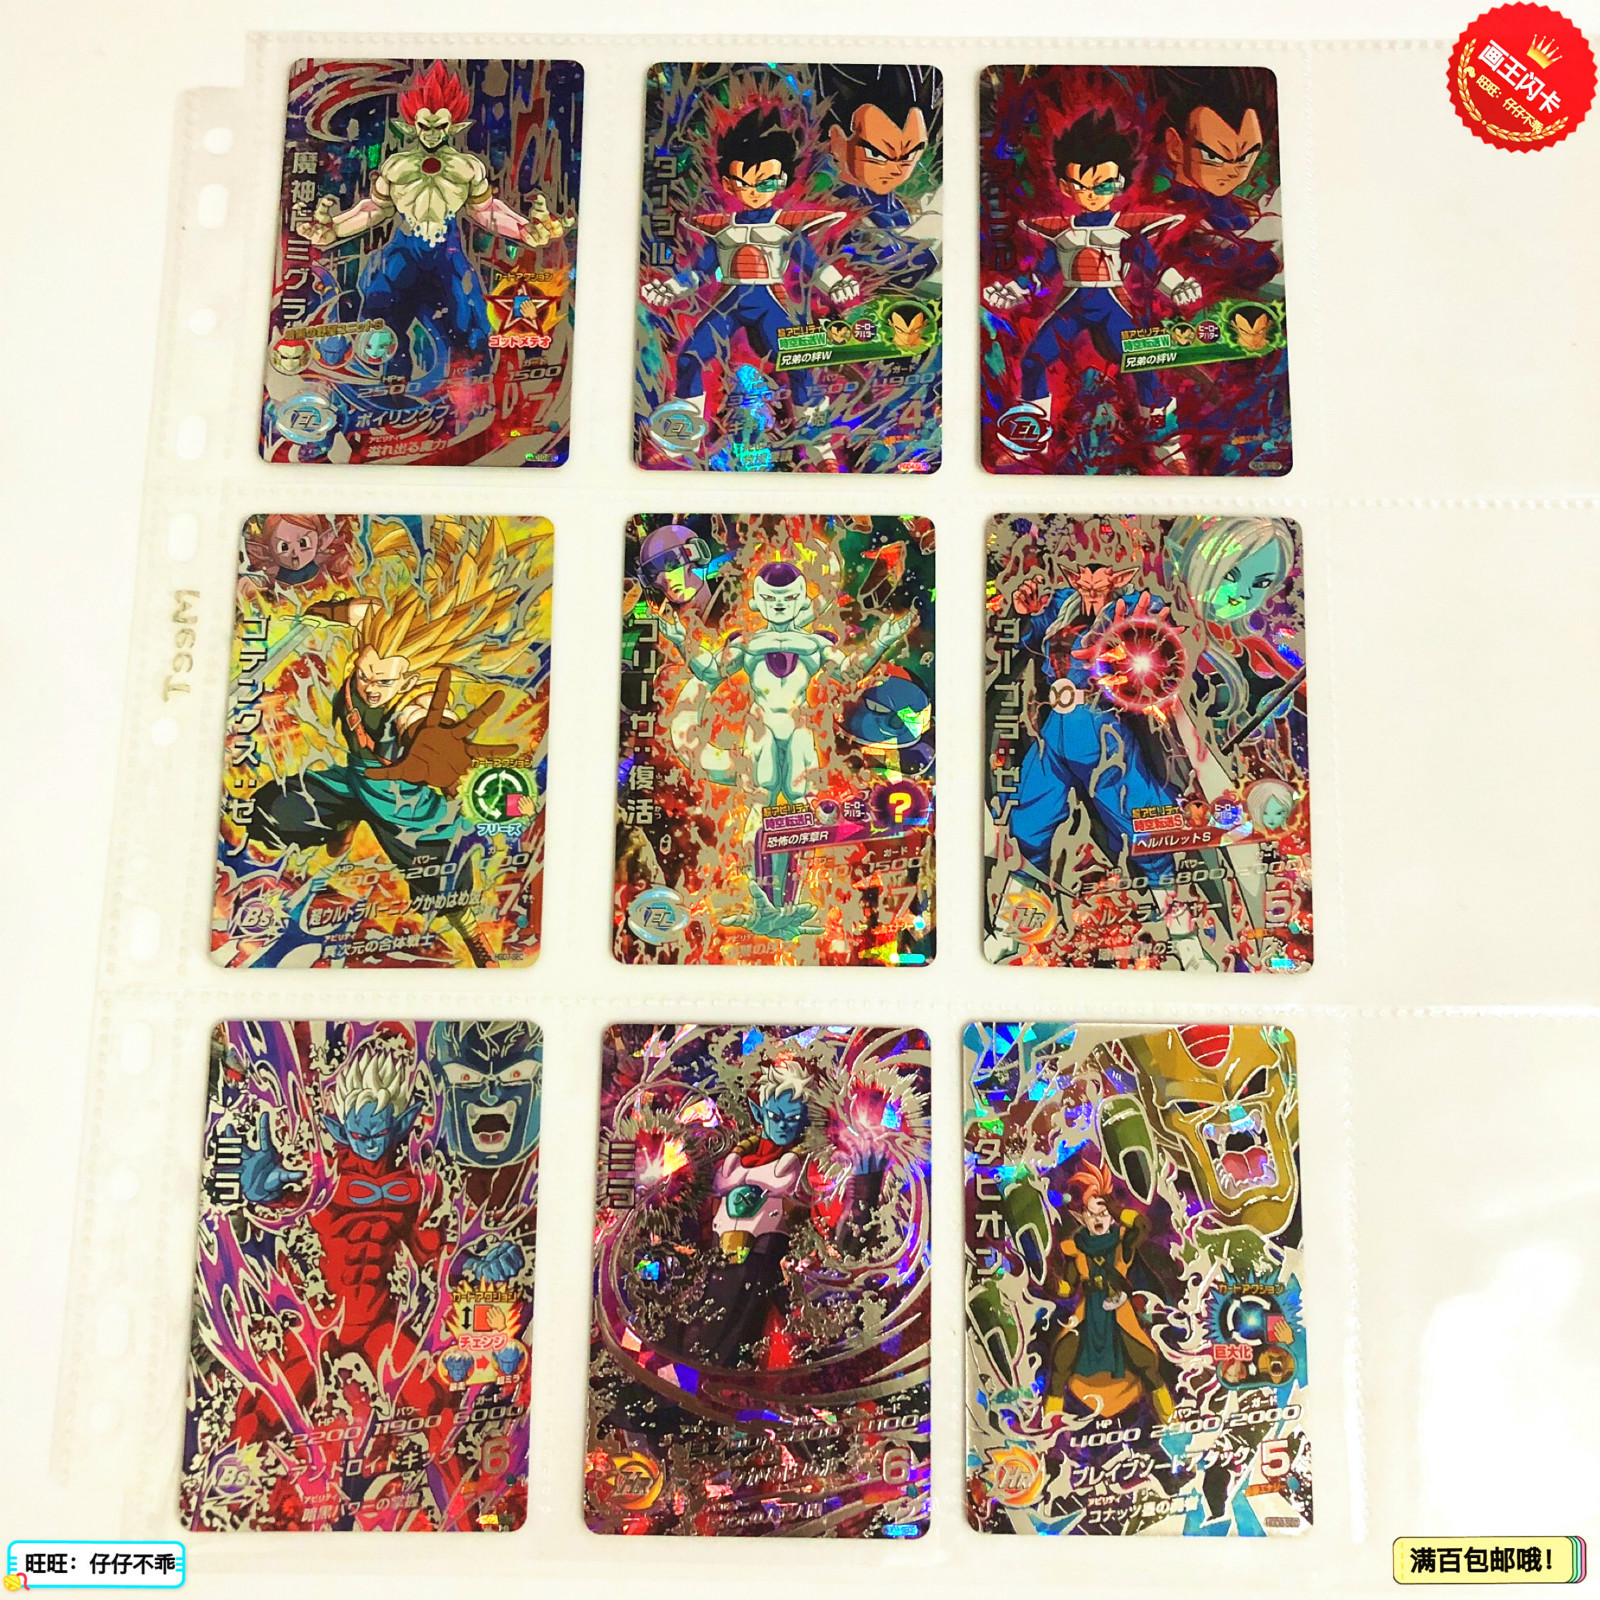 Japan Original Dragon Ball Hero Card SEC 4 Stars HGD Goku Toys Hobbies Collectibles Game Collection Anime Cards